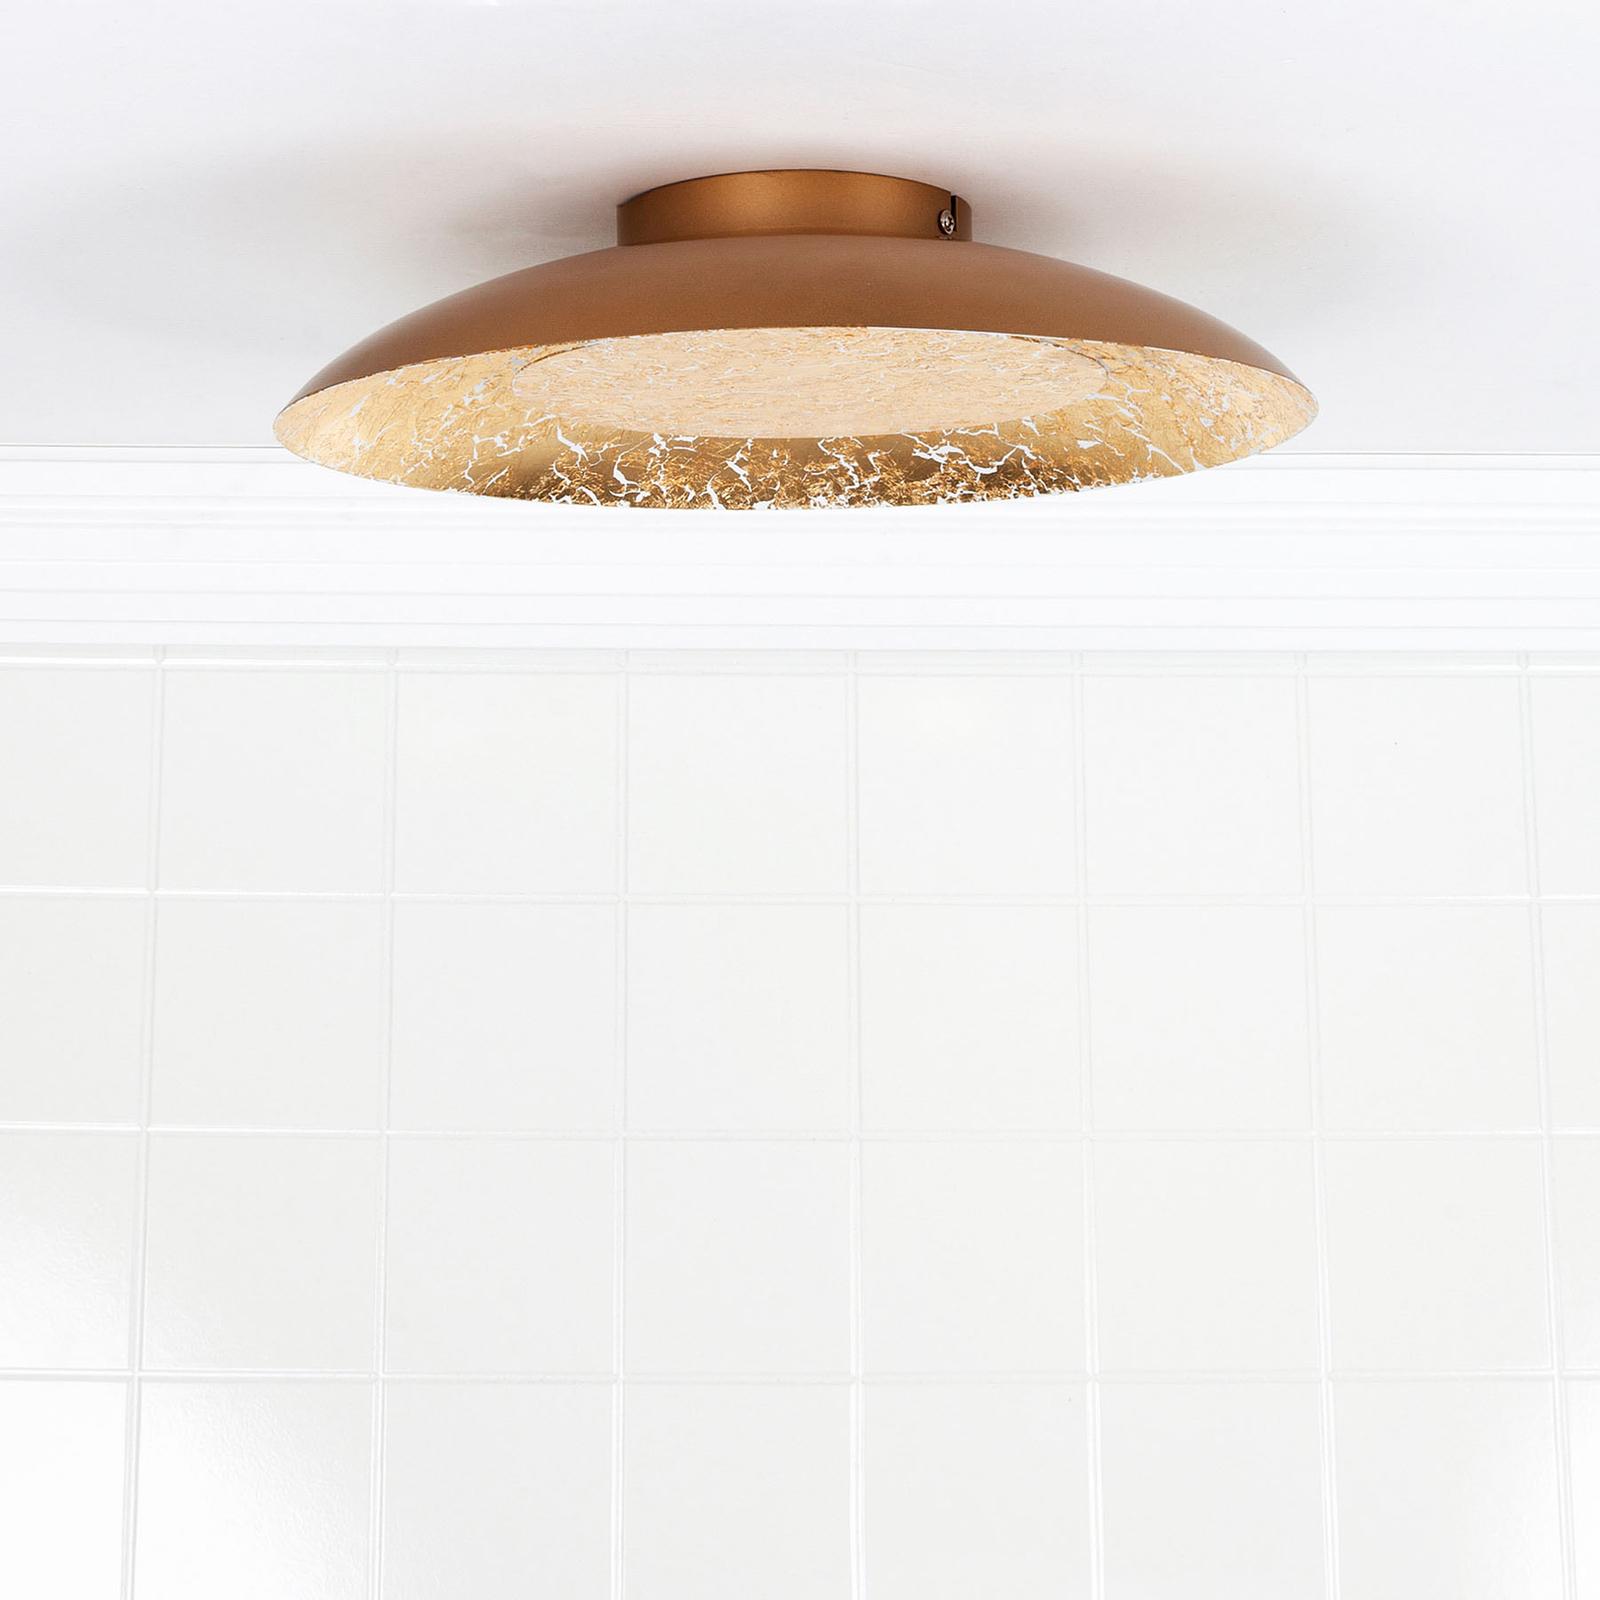 LED plafondlamp Foskal messing, Ø 34,5 cm